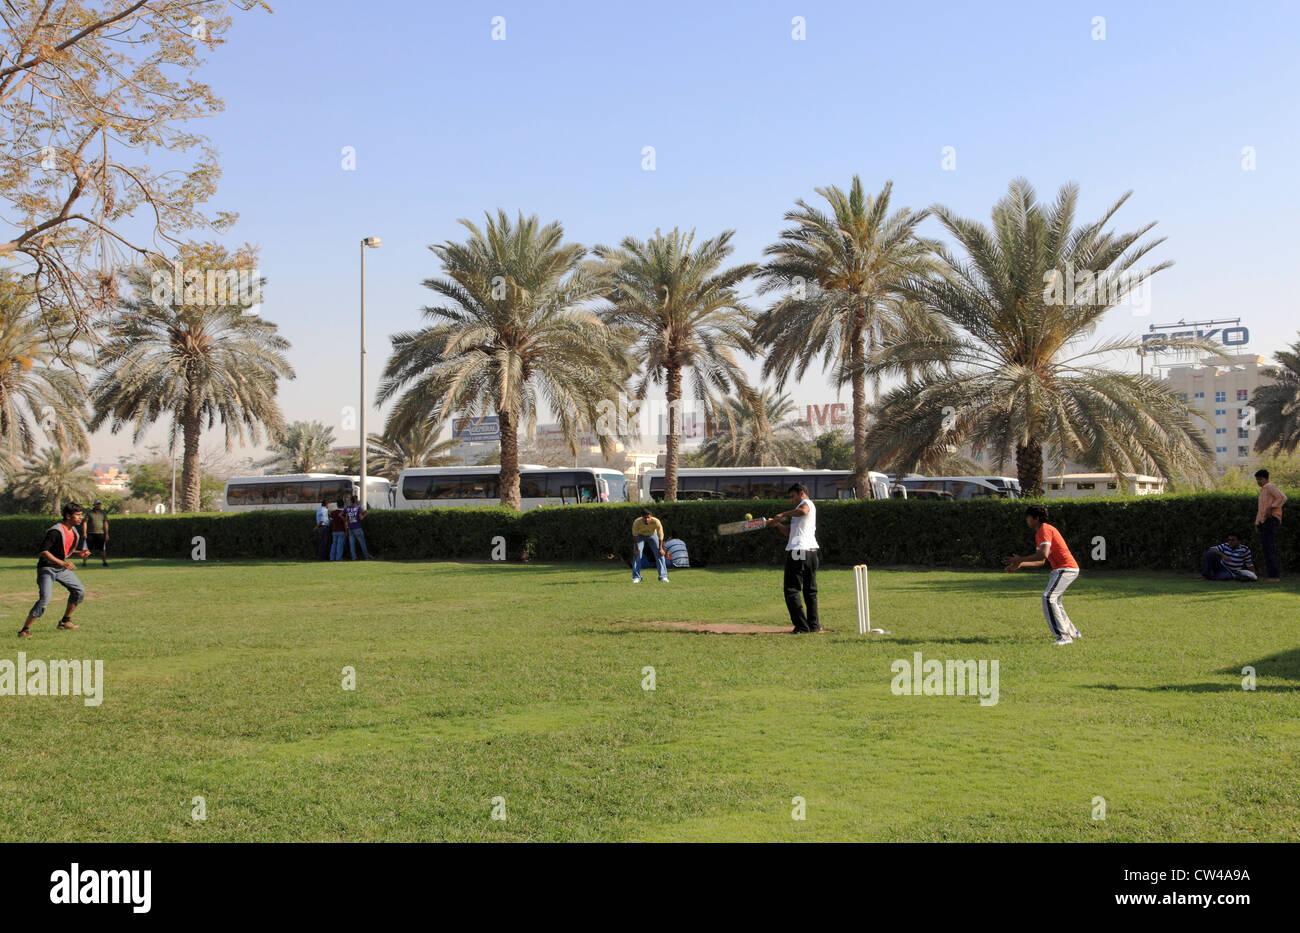 3499. Cricket, Indian & Pakistani workers, Dubai, UAE. - Stock Image